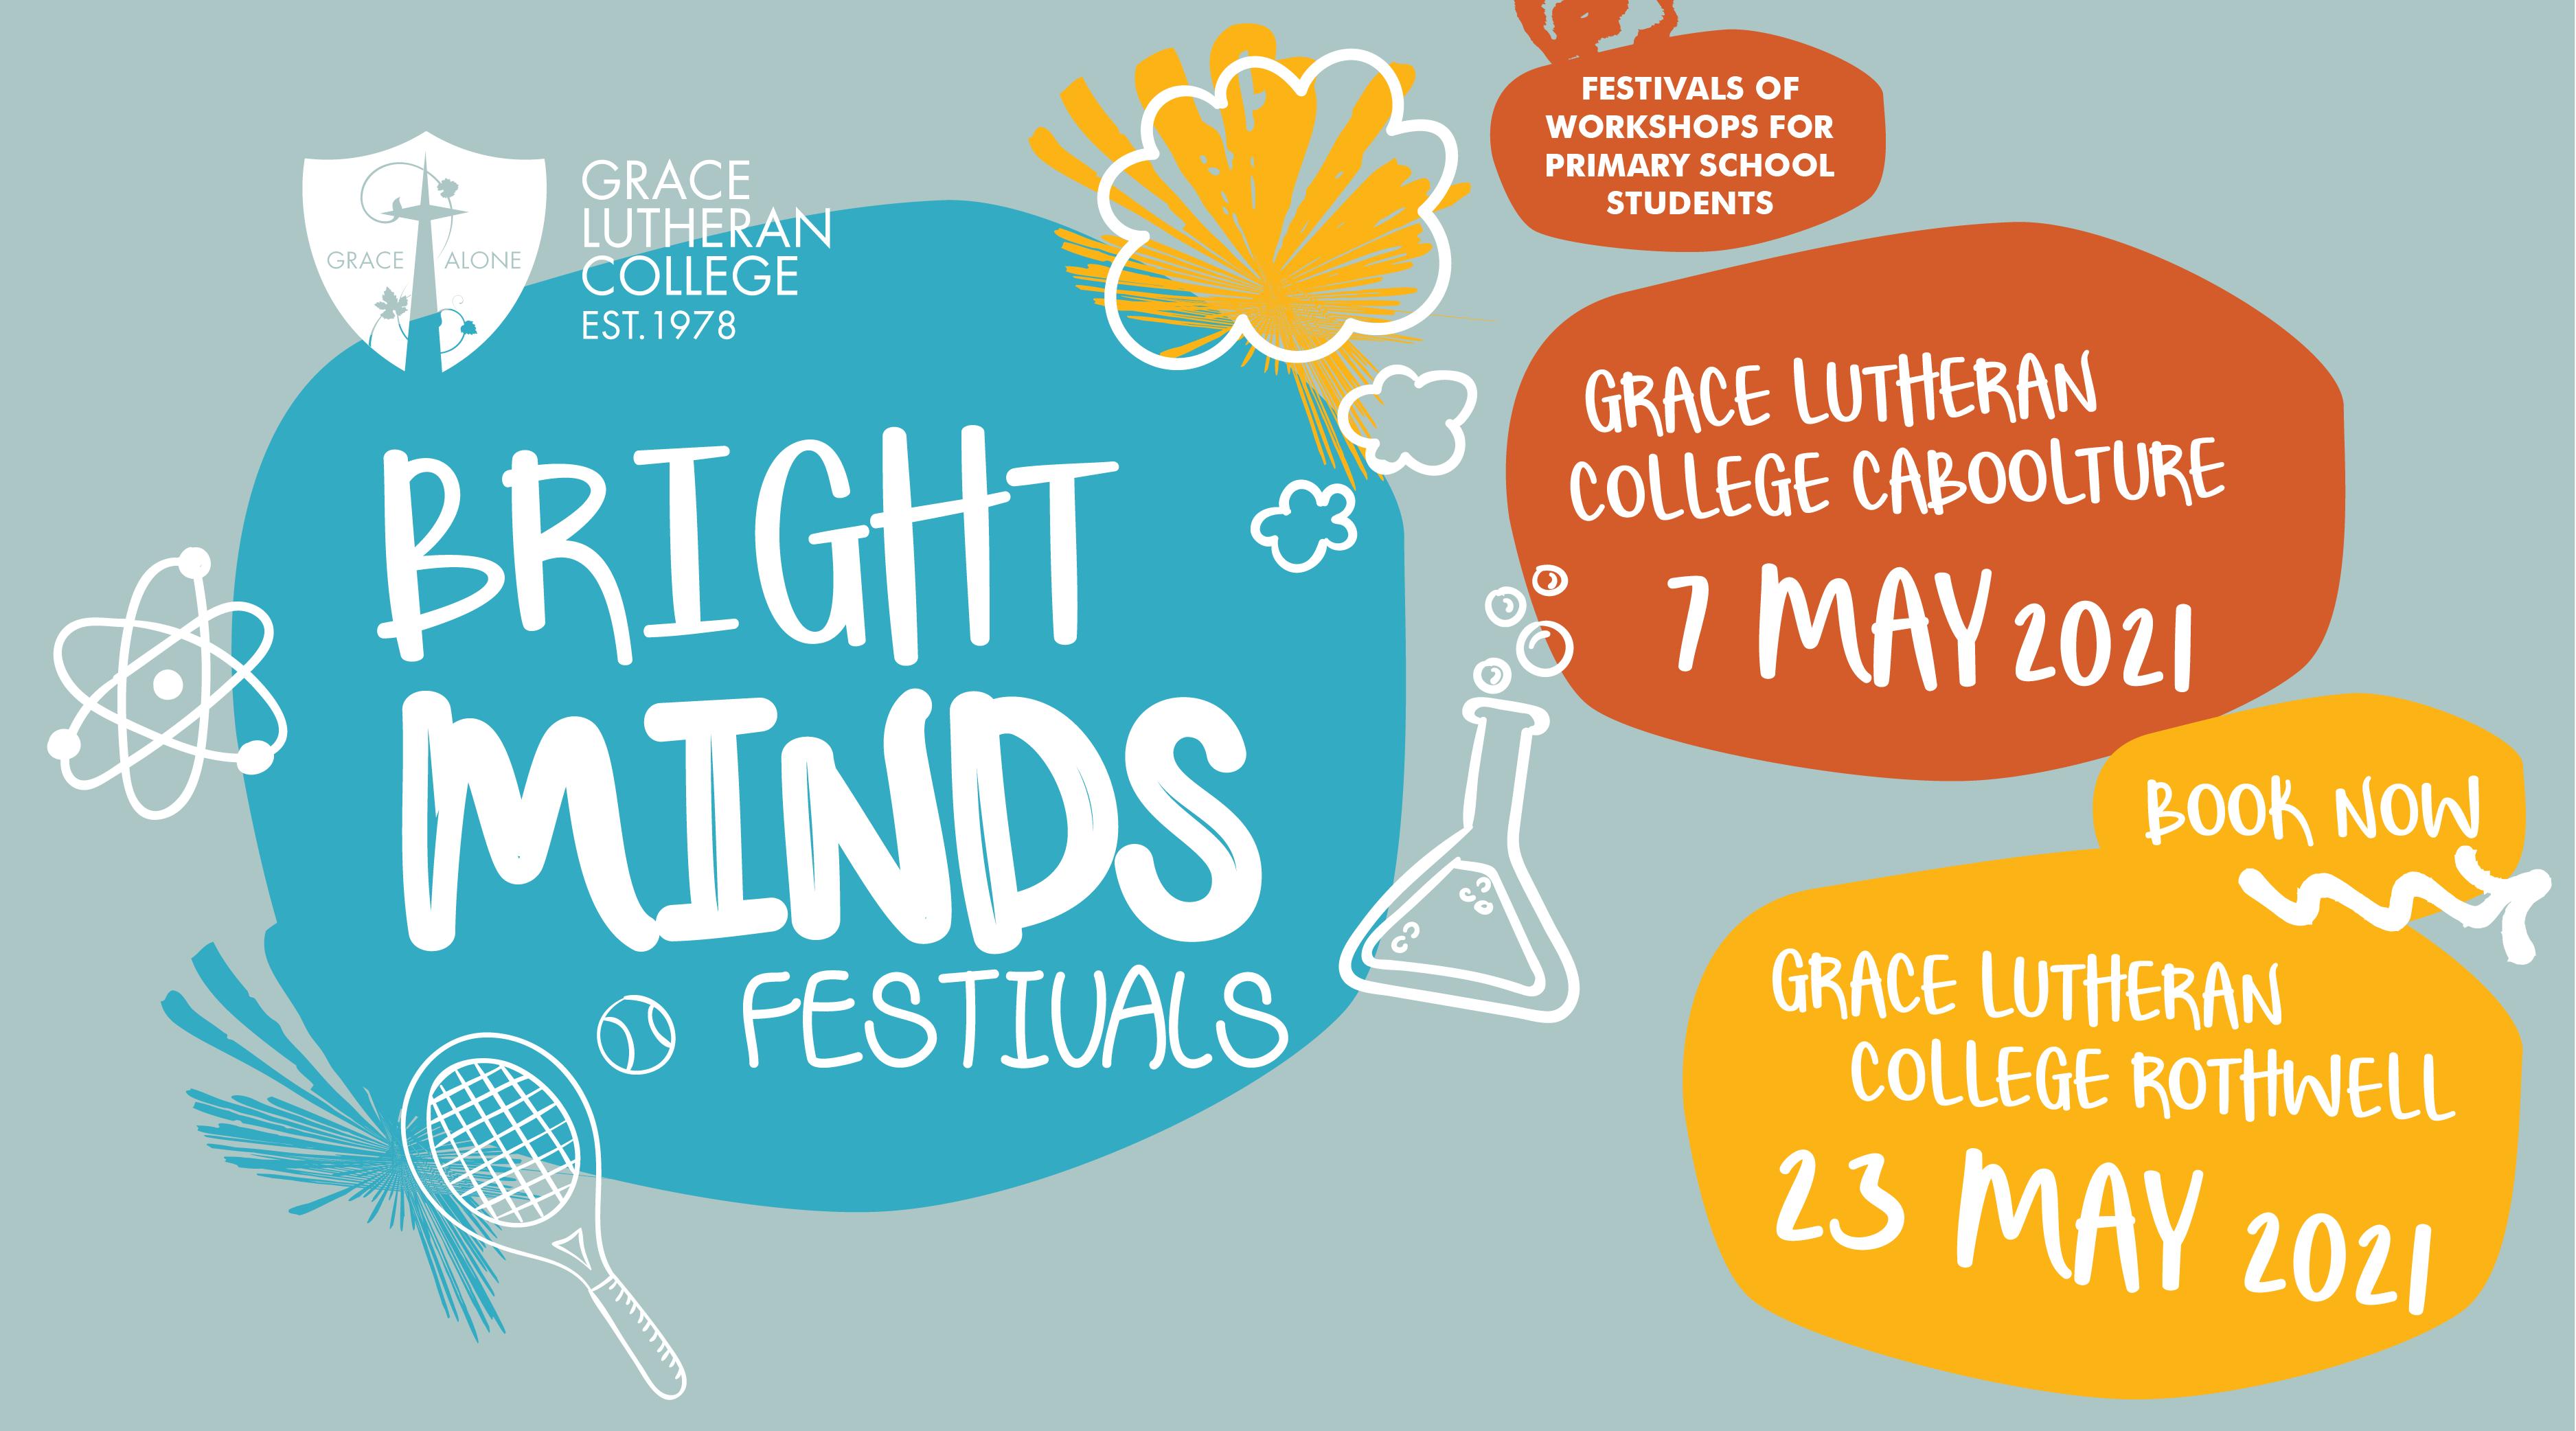 Bright Minds Festivals